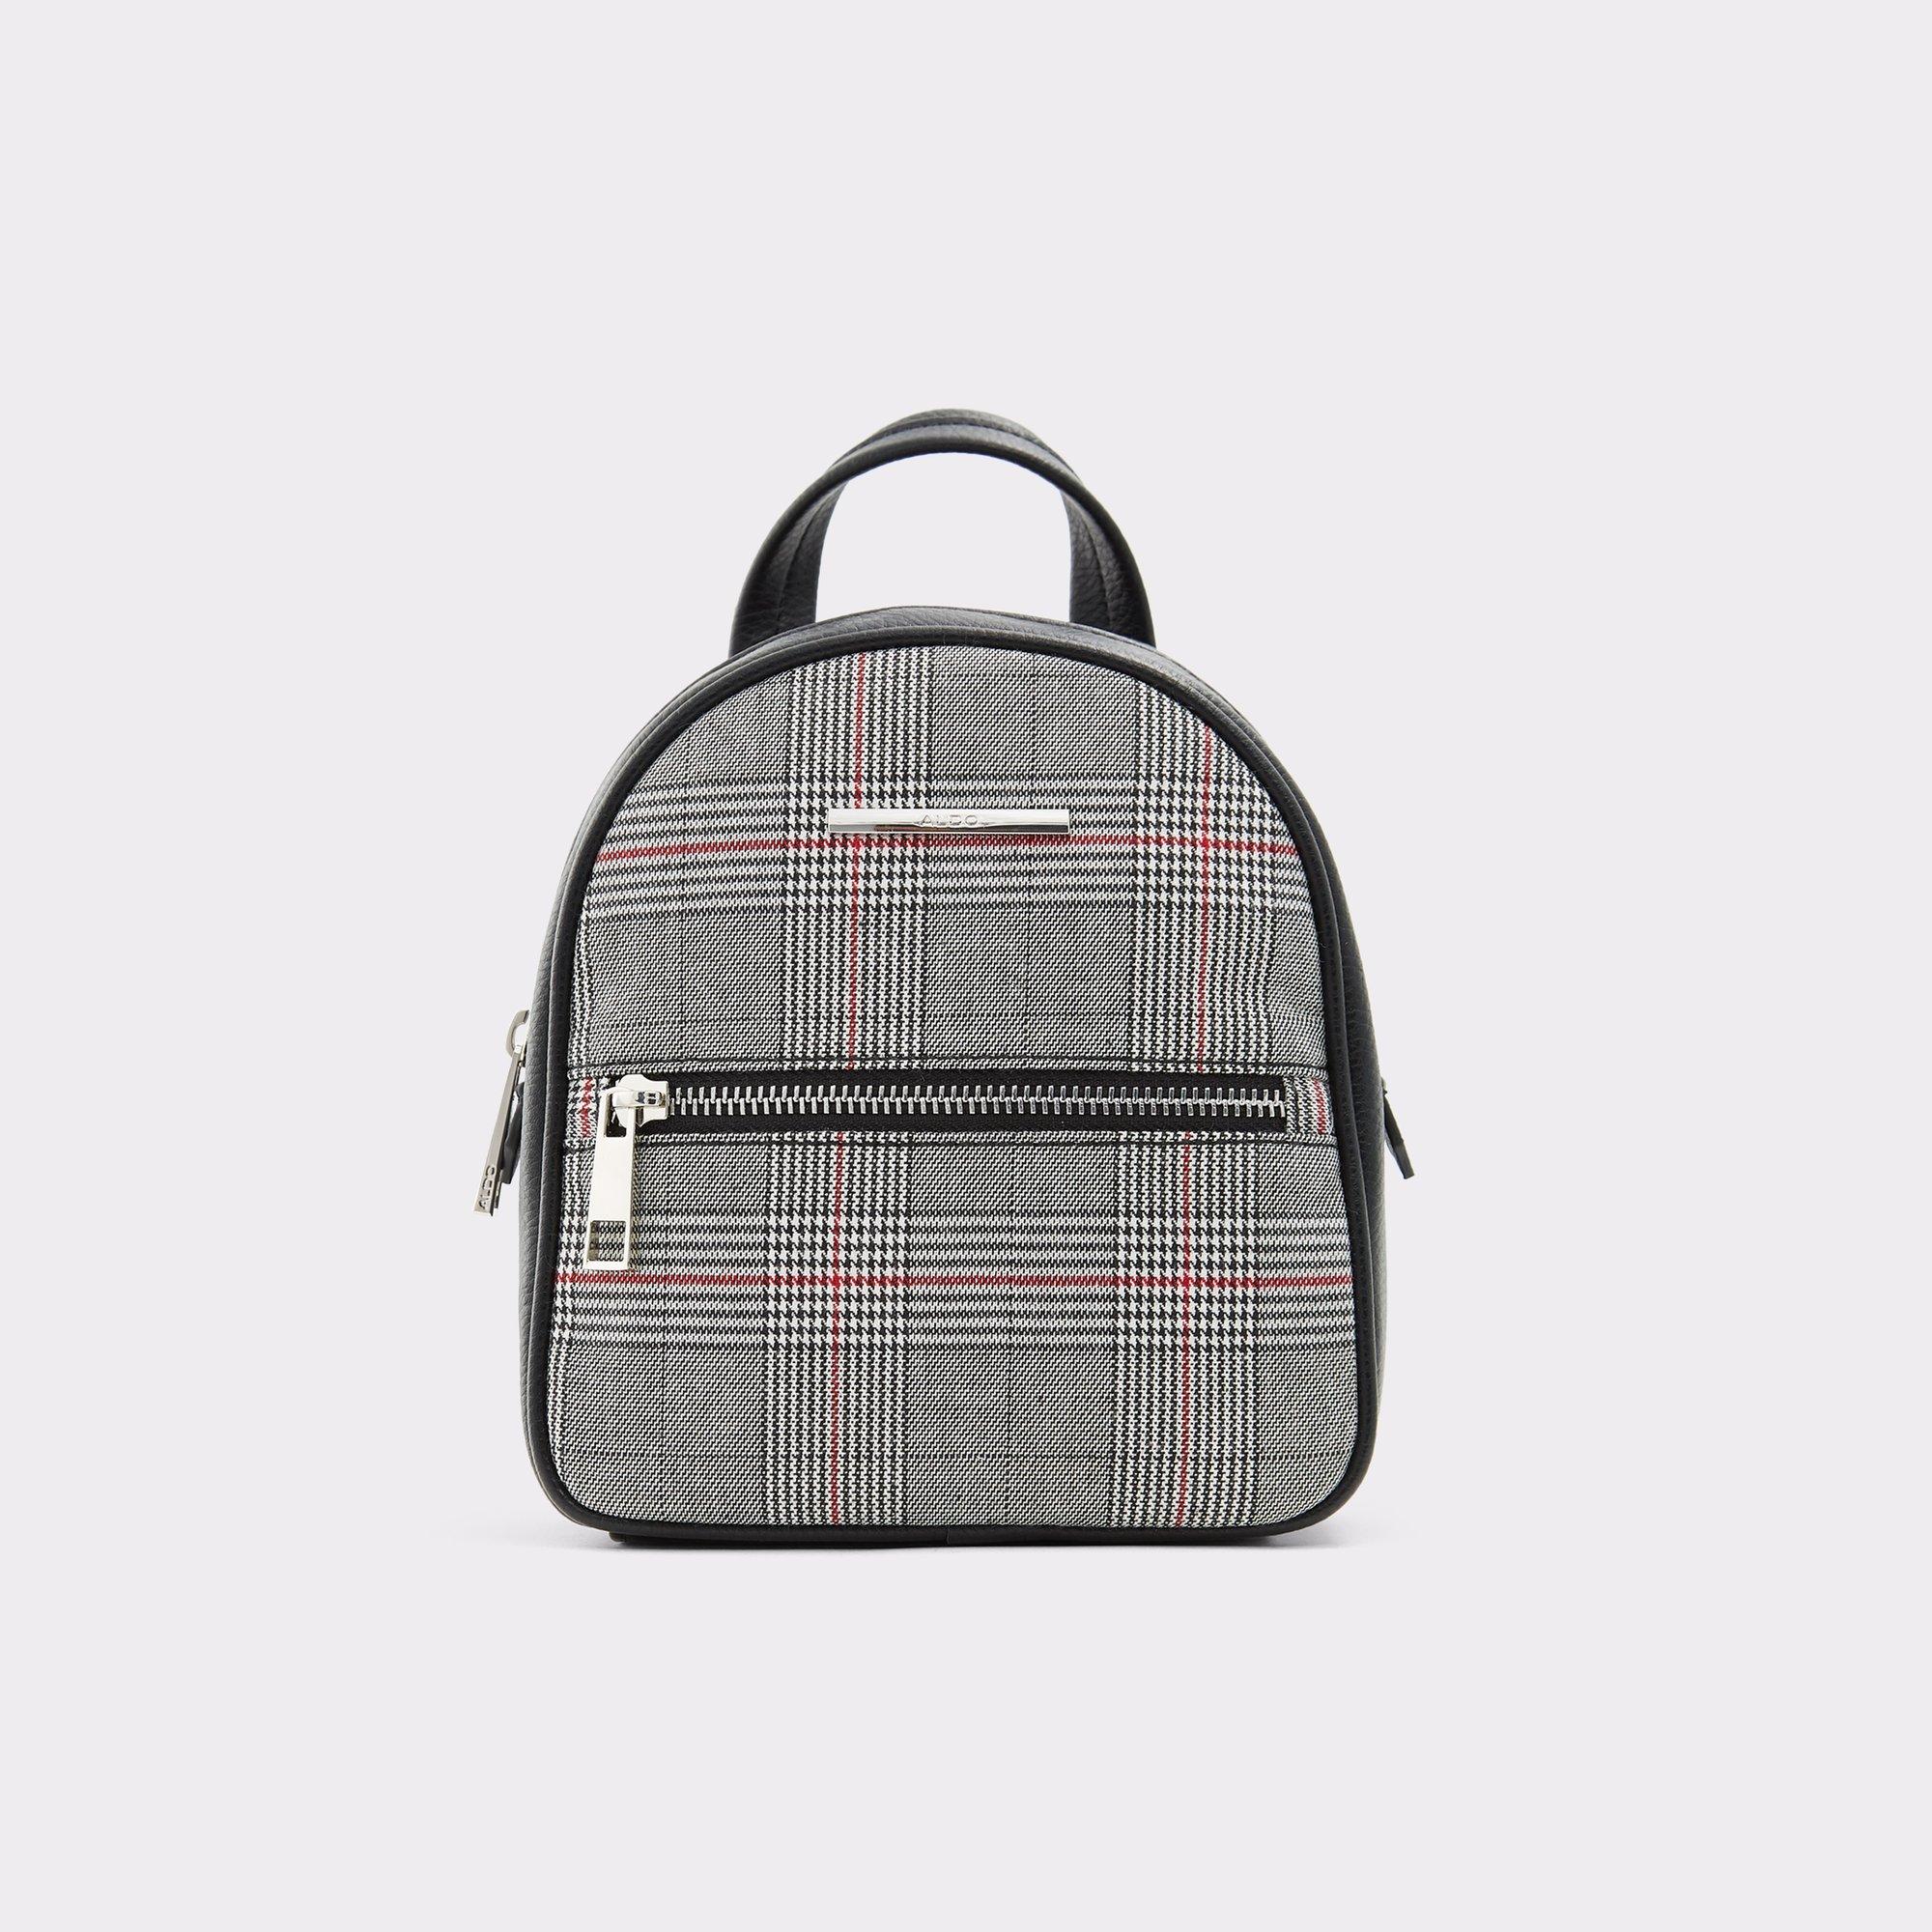 Aldo Landburyy backpack